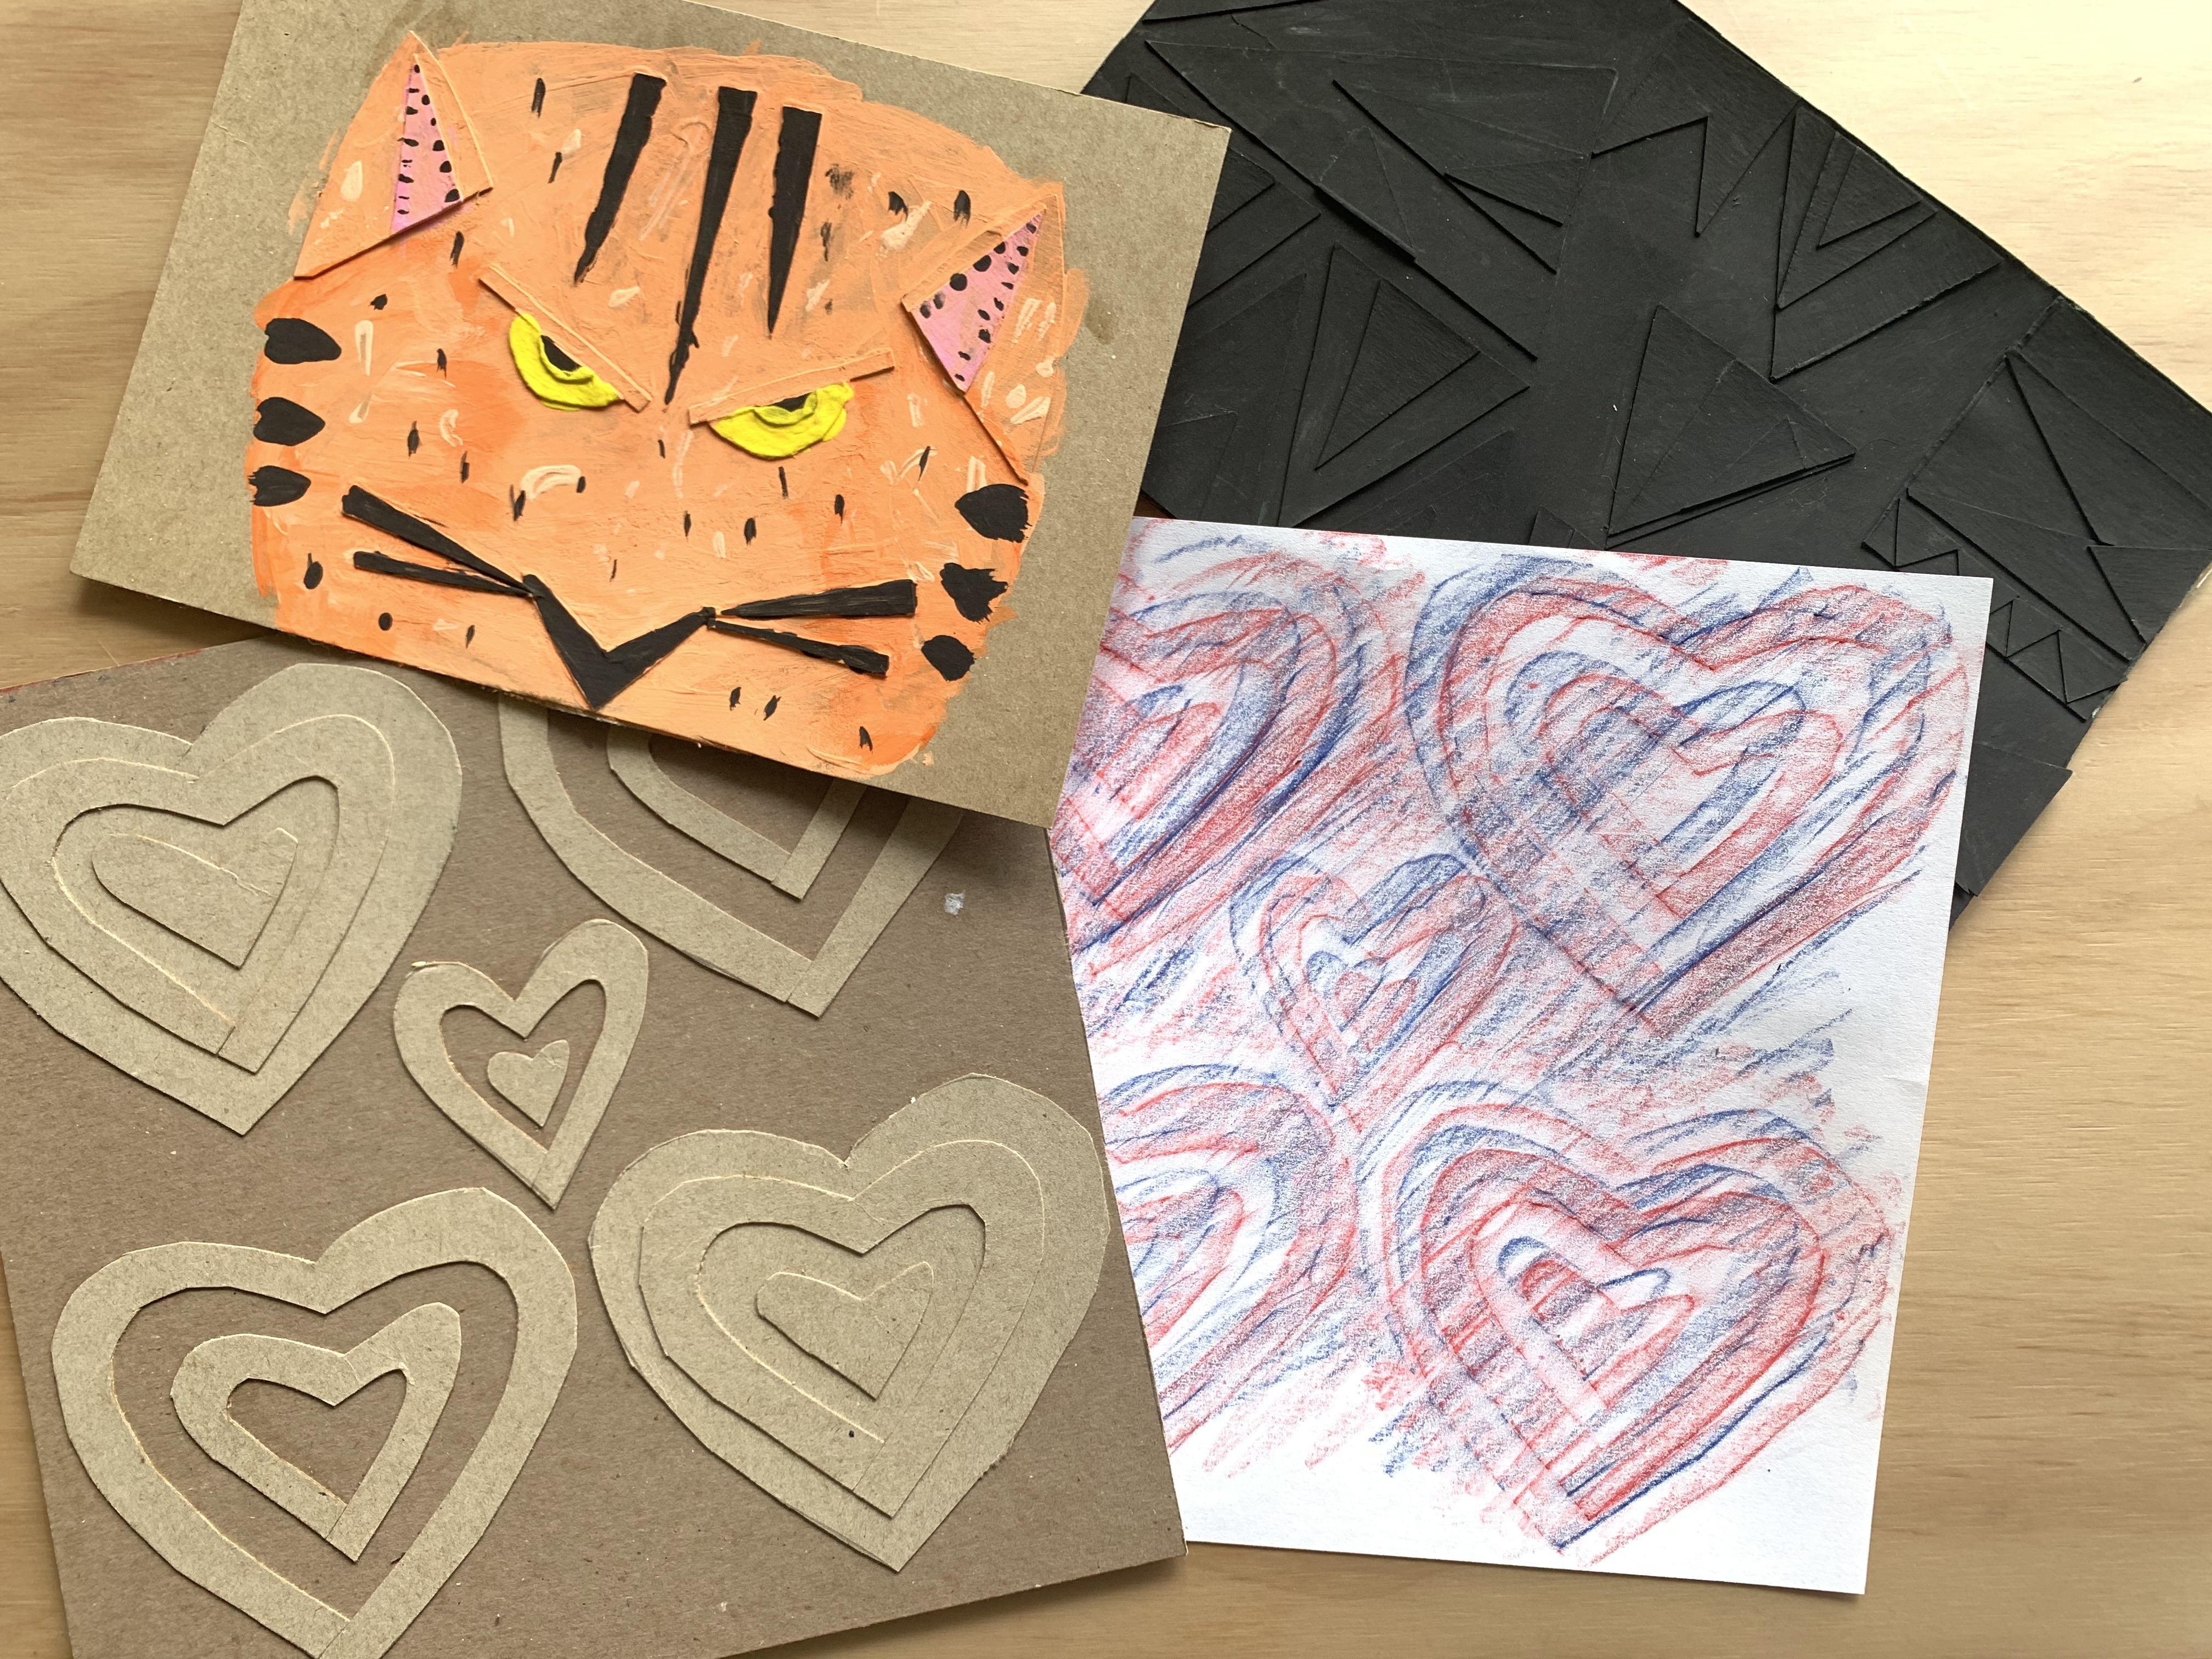 cardboard-collage-rubbing-plate-assemblage.jpg